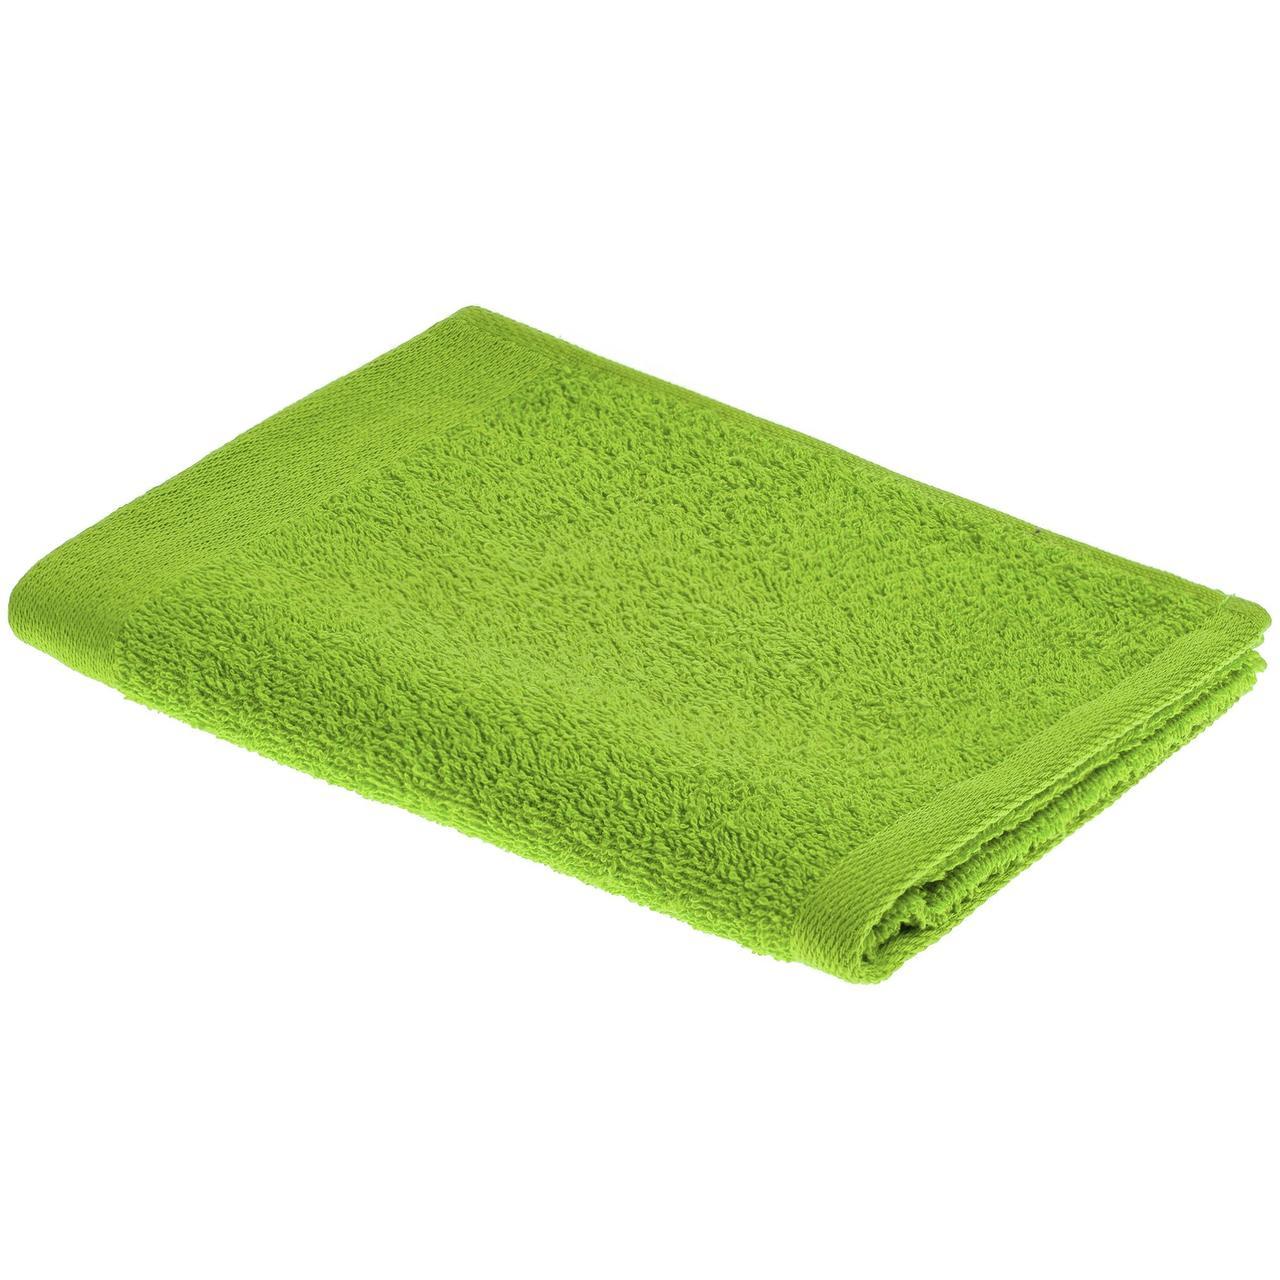 Полотенце Soft Me Light, малое, зеленое яблоко (артикул 15116.94)